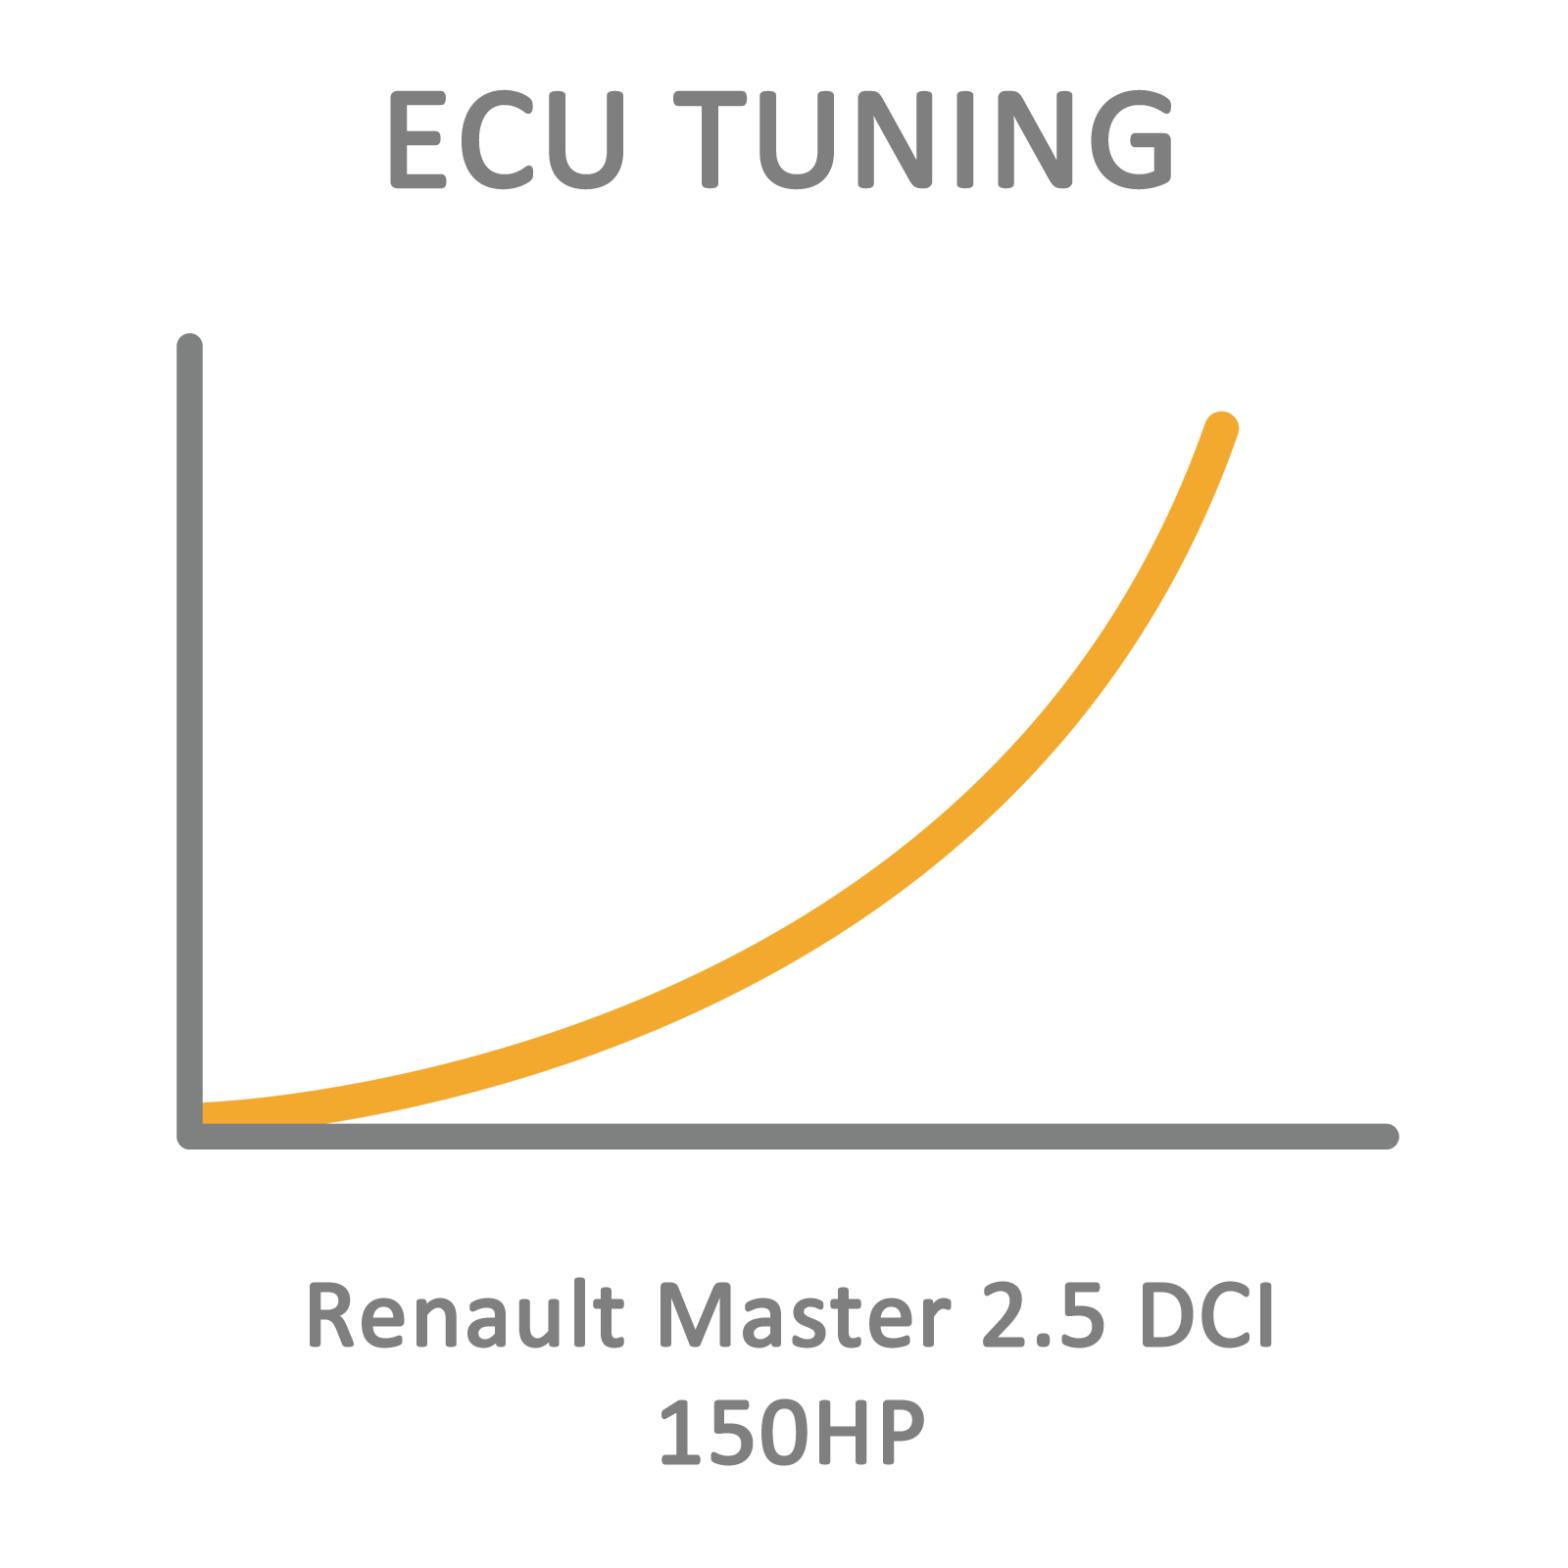 Renault Master 2.5 DCI 150HP ECU Tuning Remapping Programming